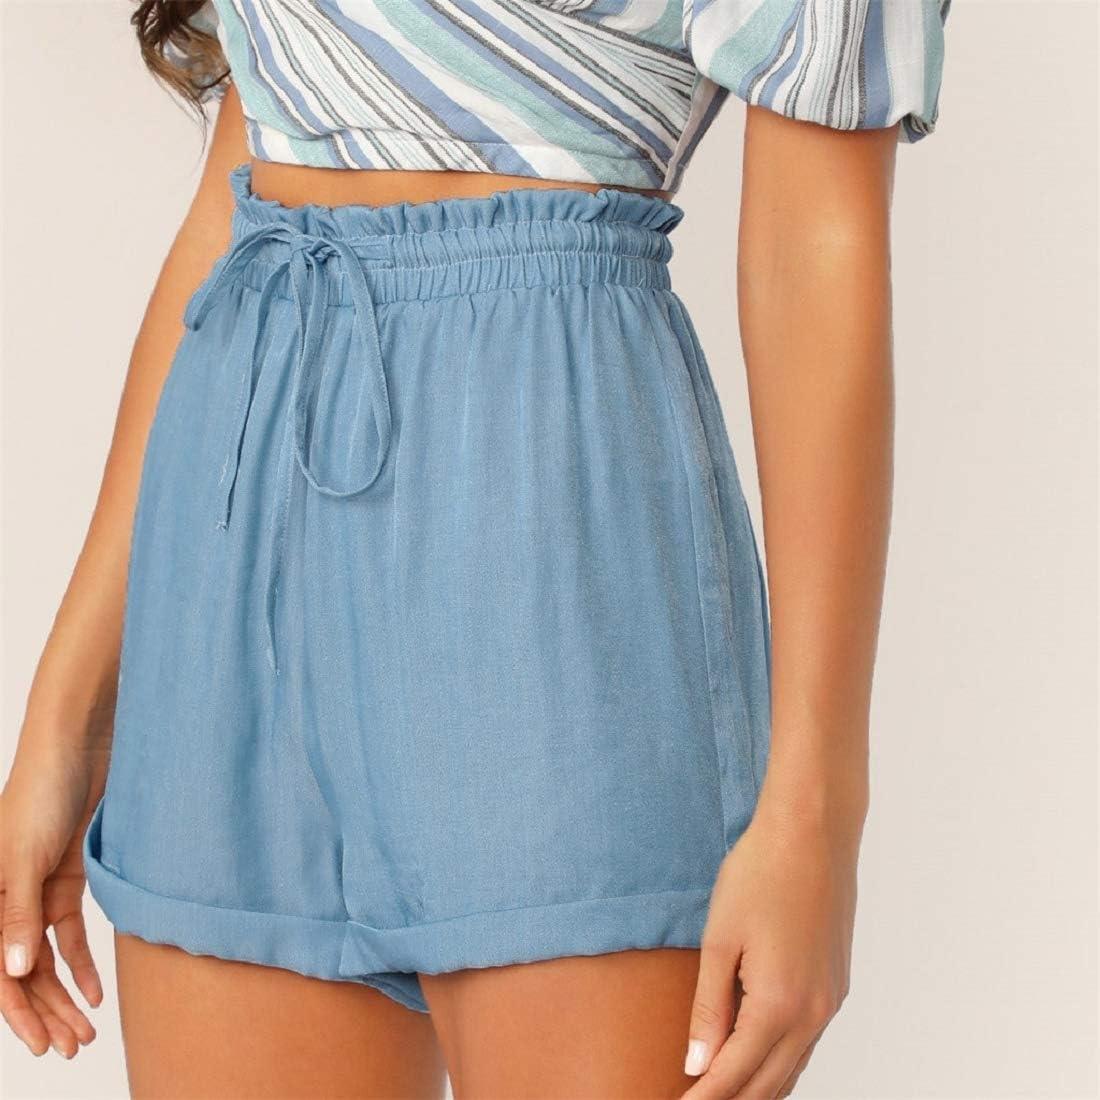 Womens Casual Drawstring Elastic Waist Shorts Rolled Hem Summer Beach Shorts Solid Color Hot Pants